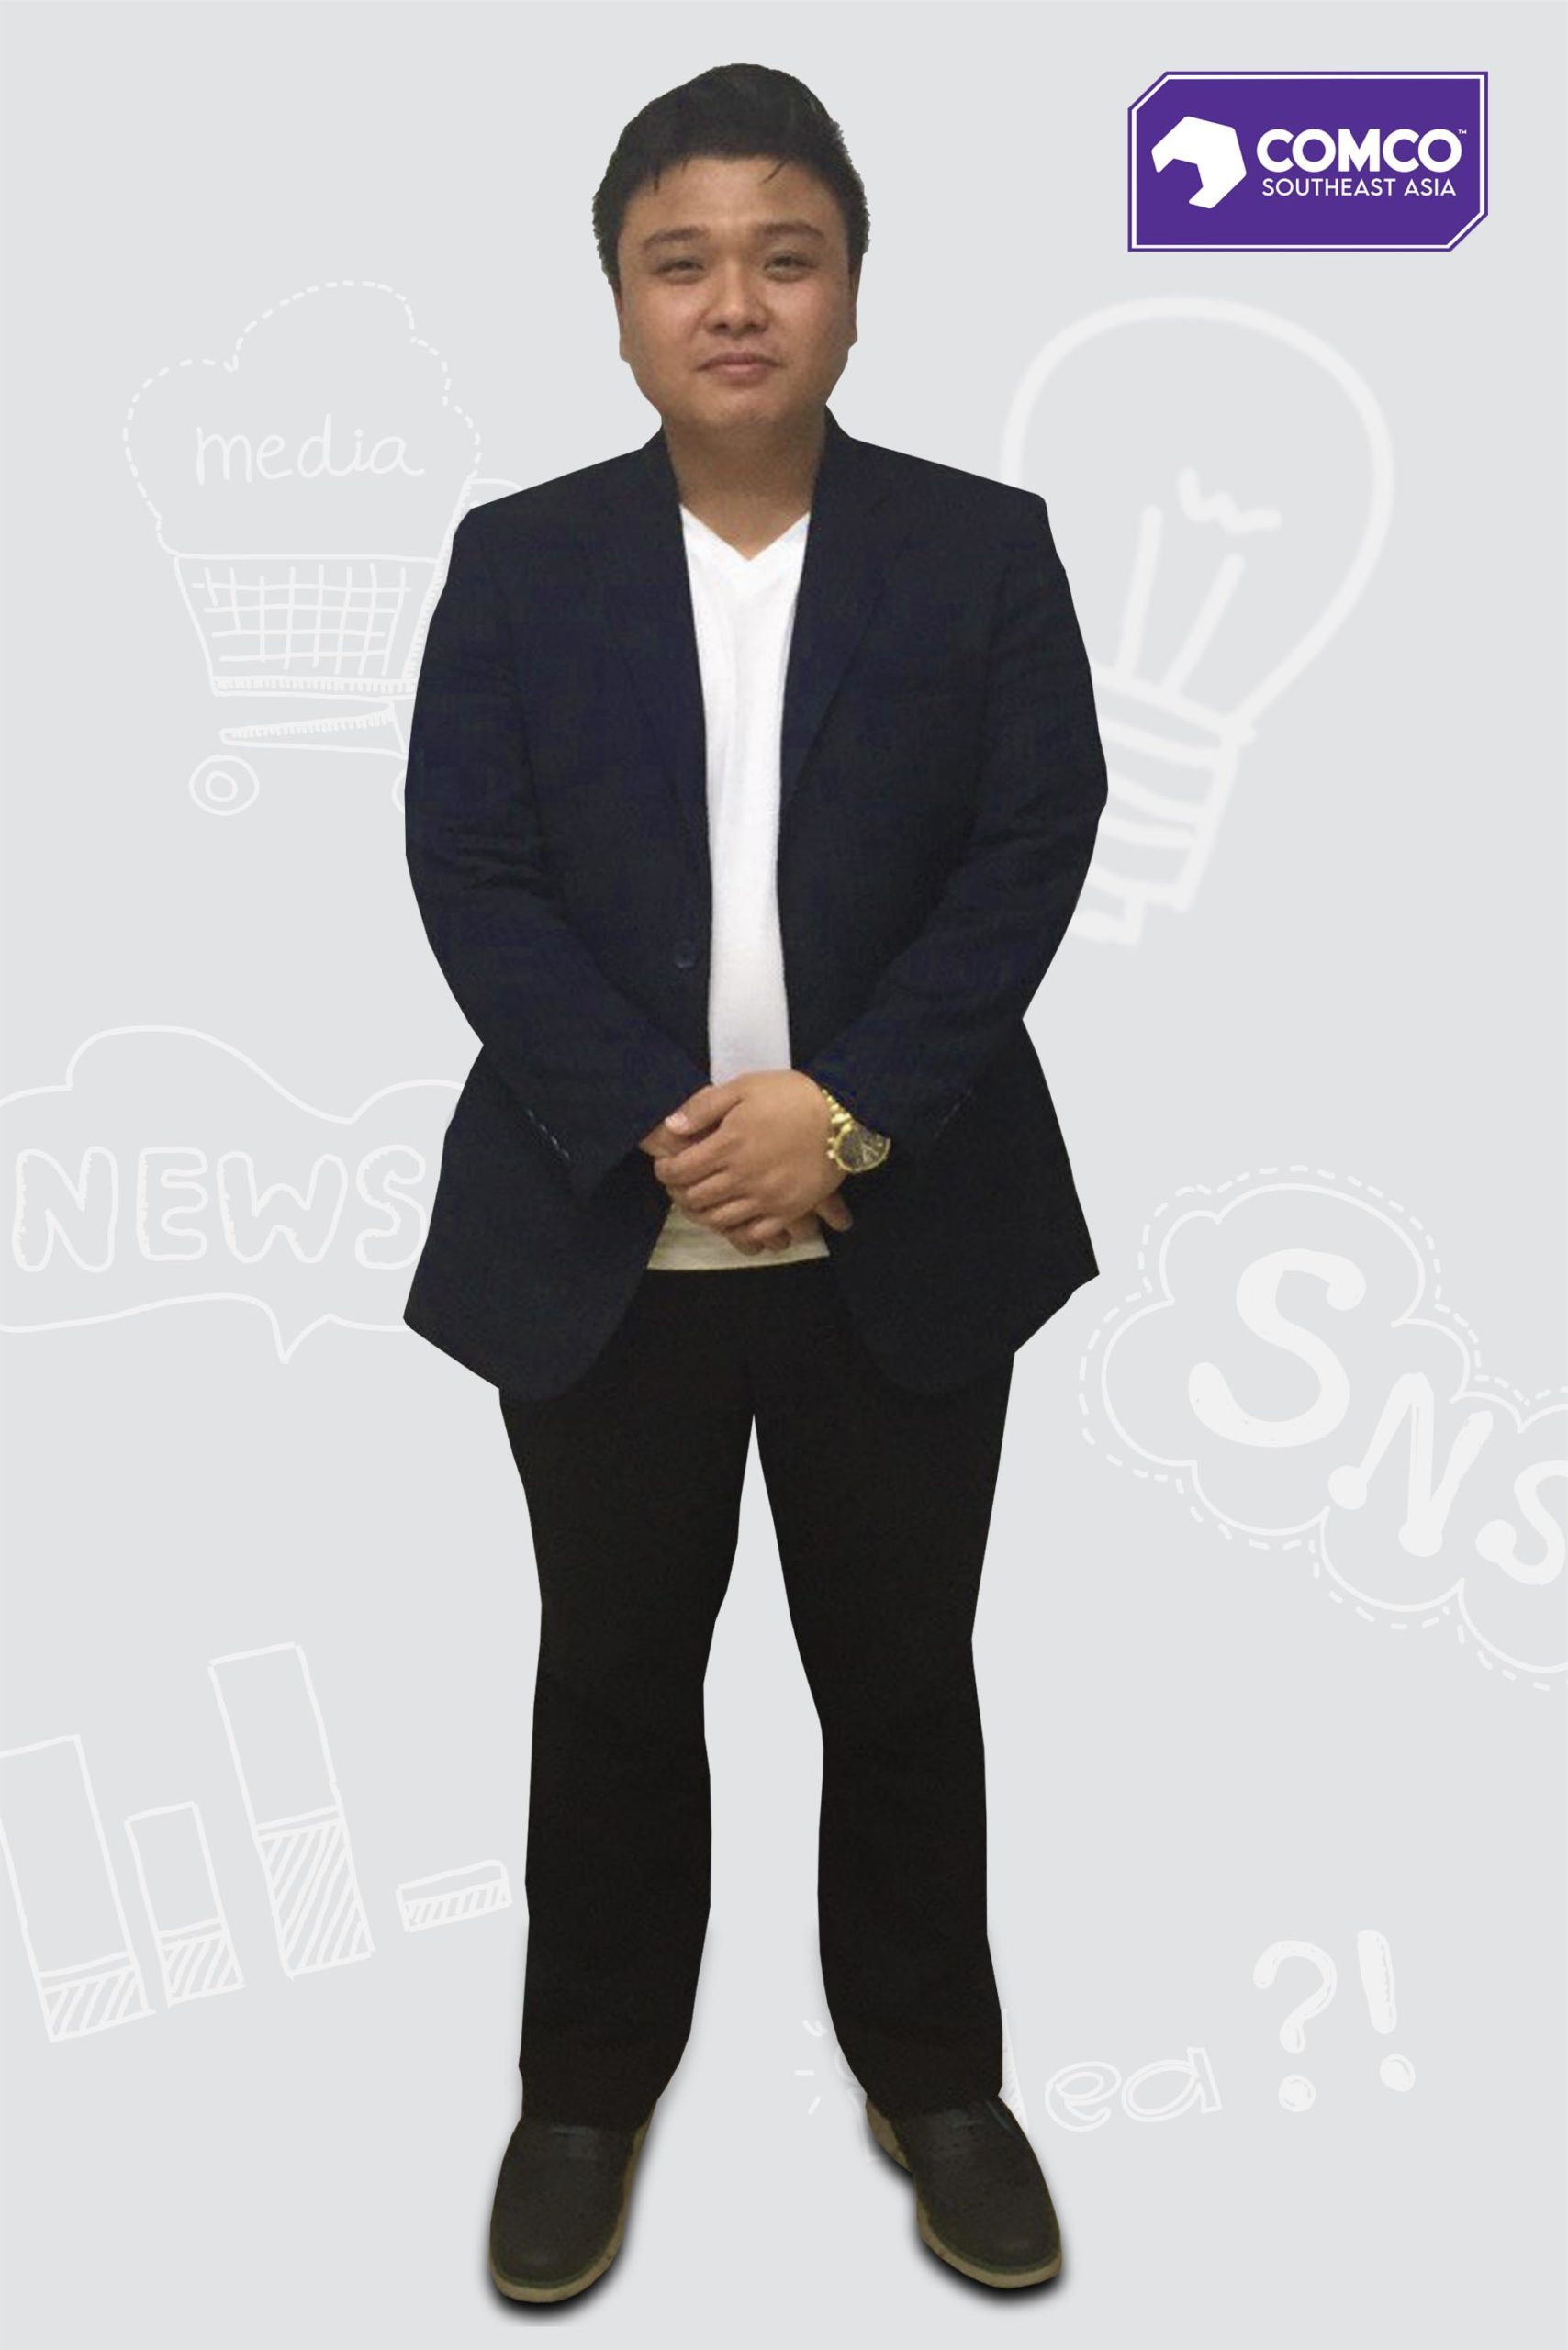 Atty. Leo Lim